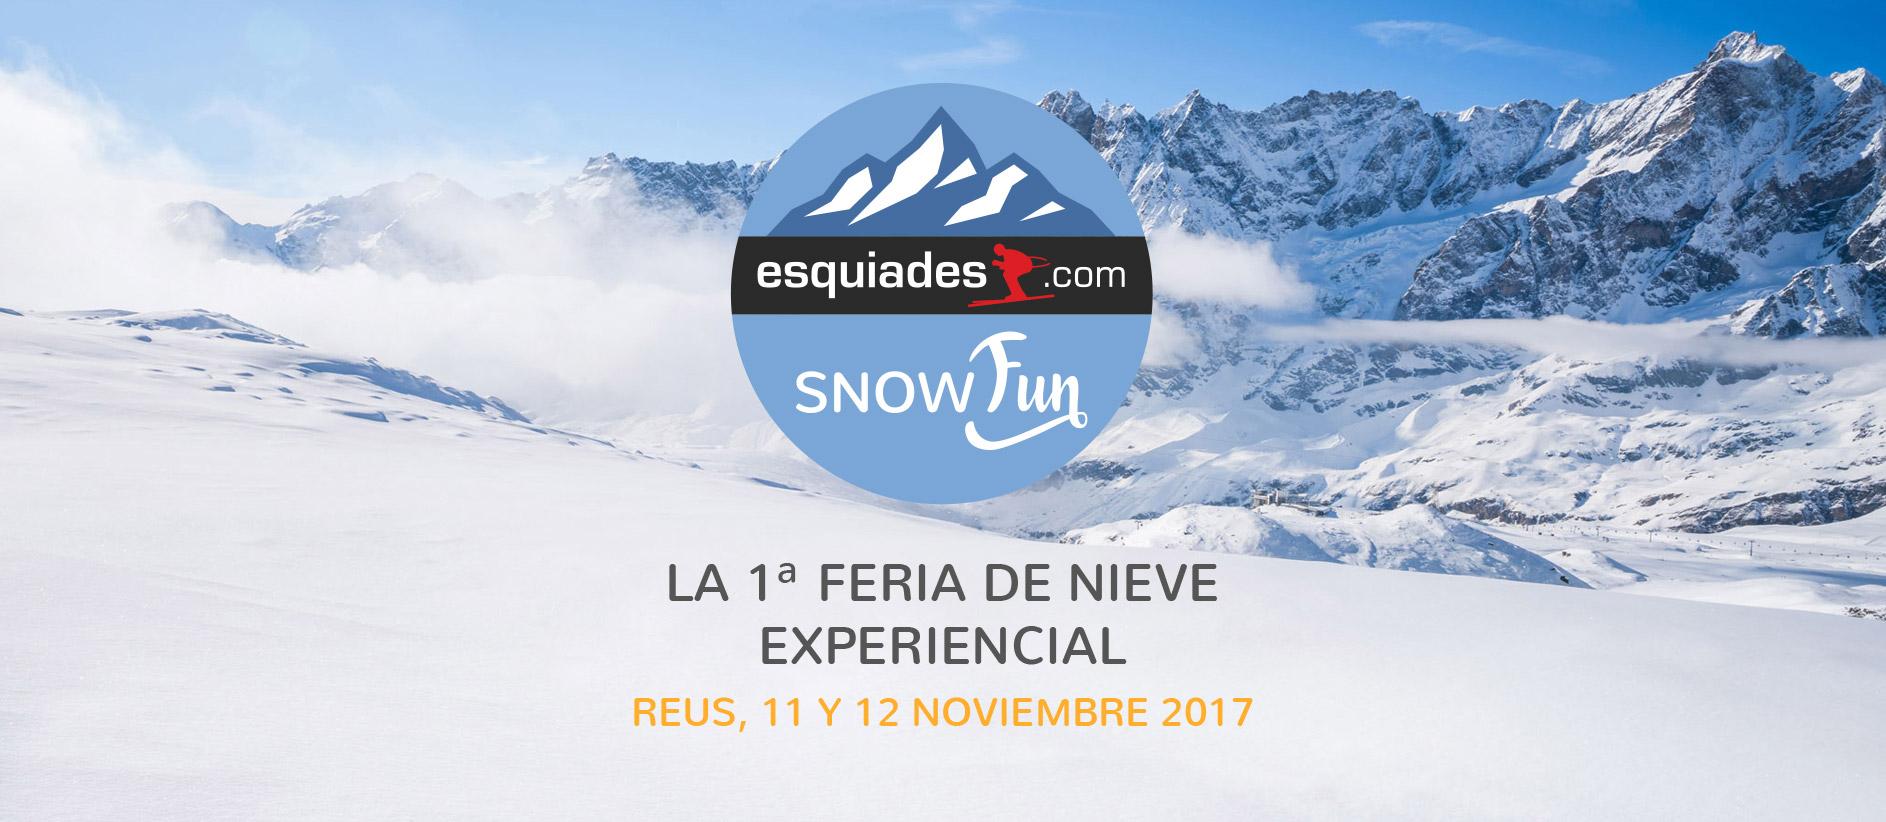 esquiades-snowfun-PORTADA-NOTICIA-cast